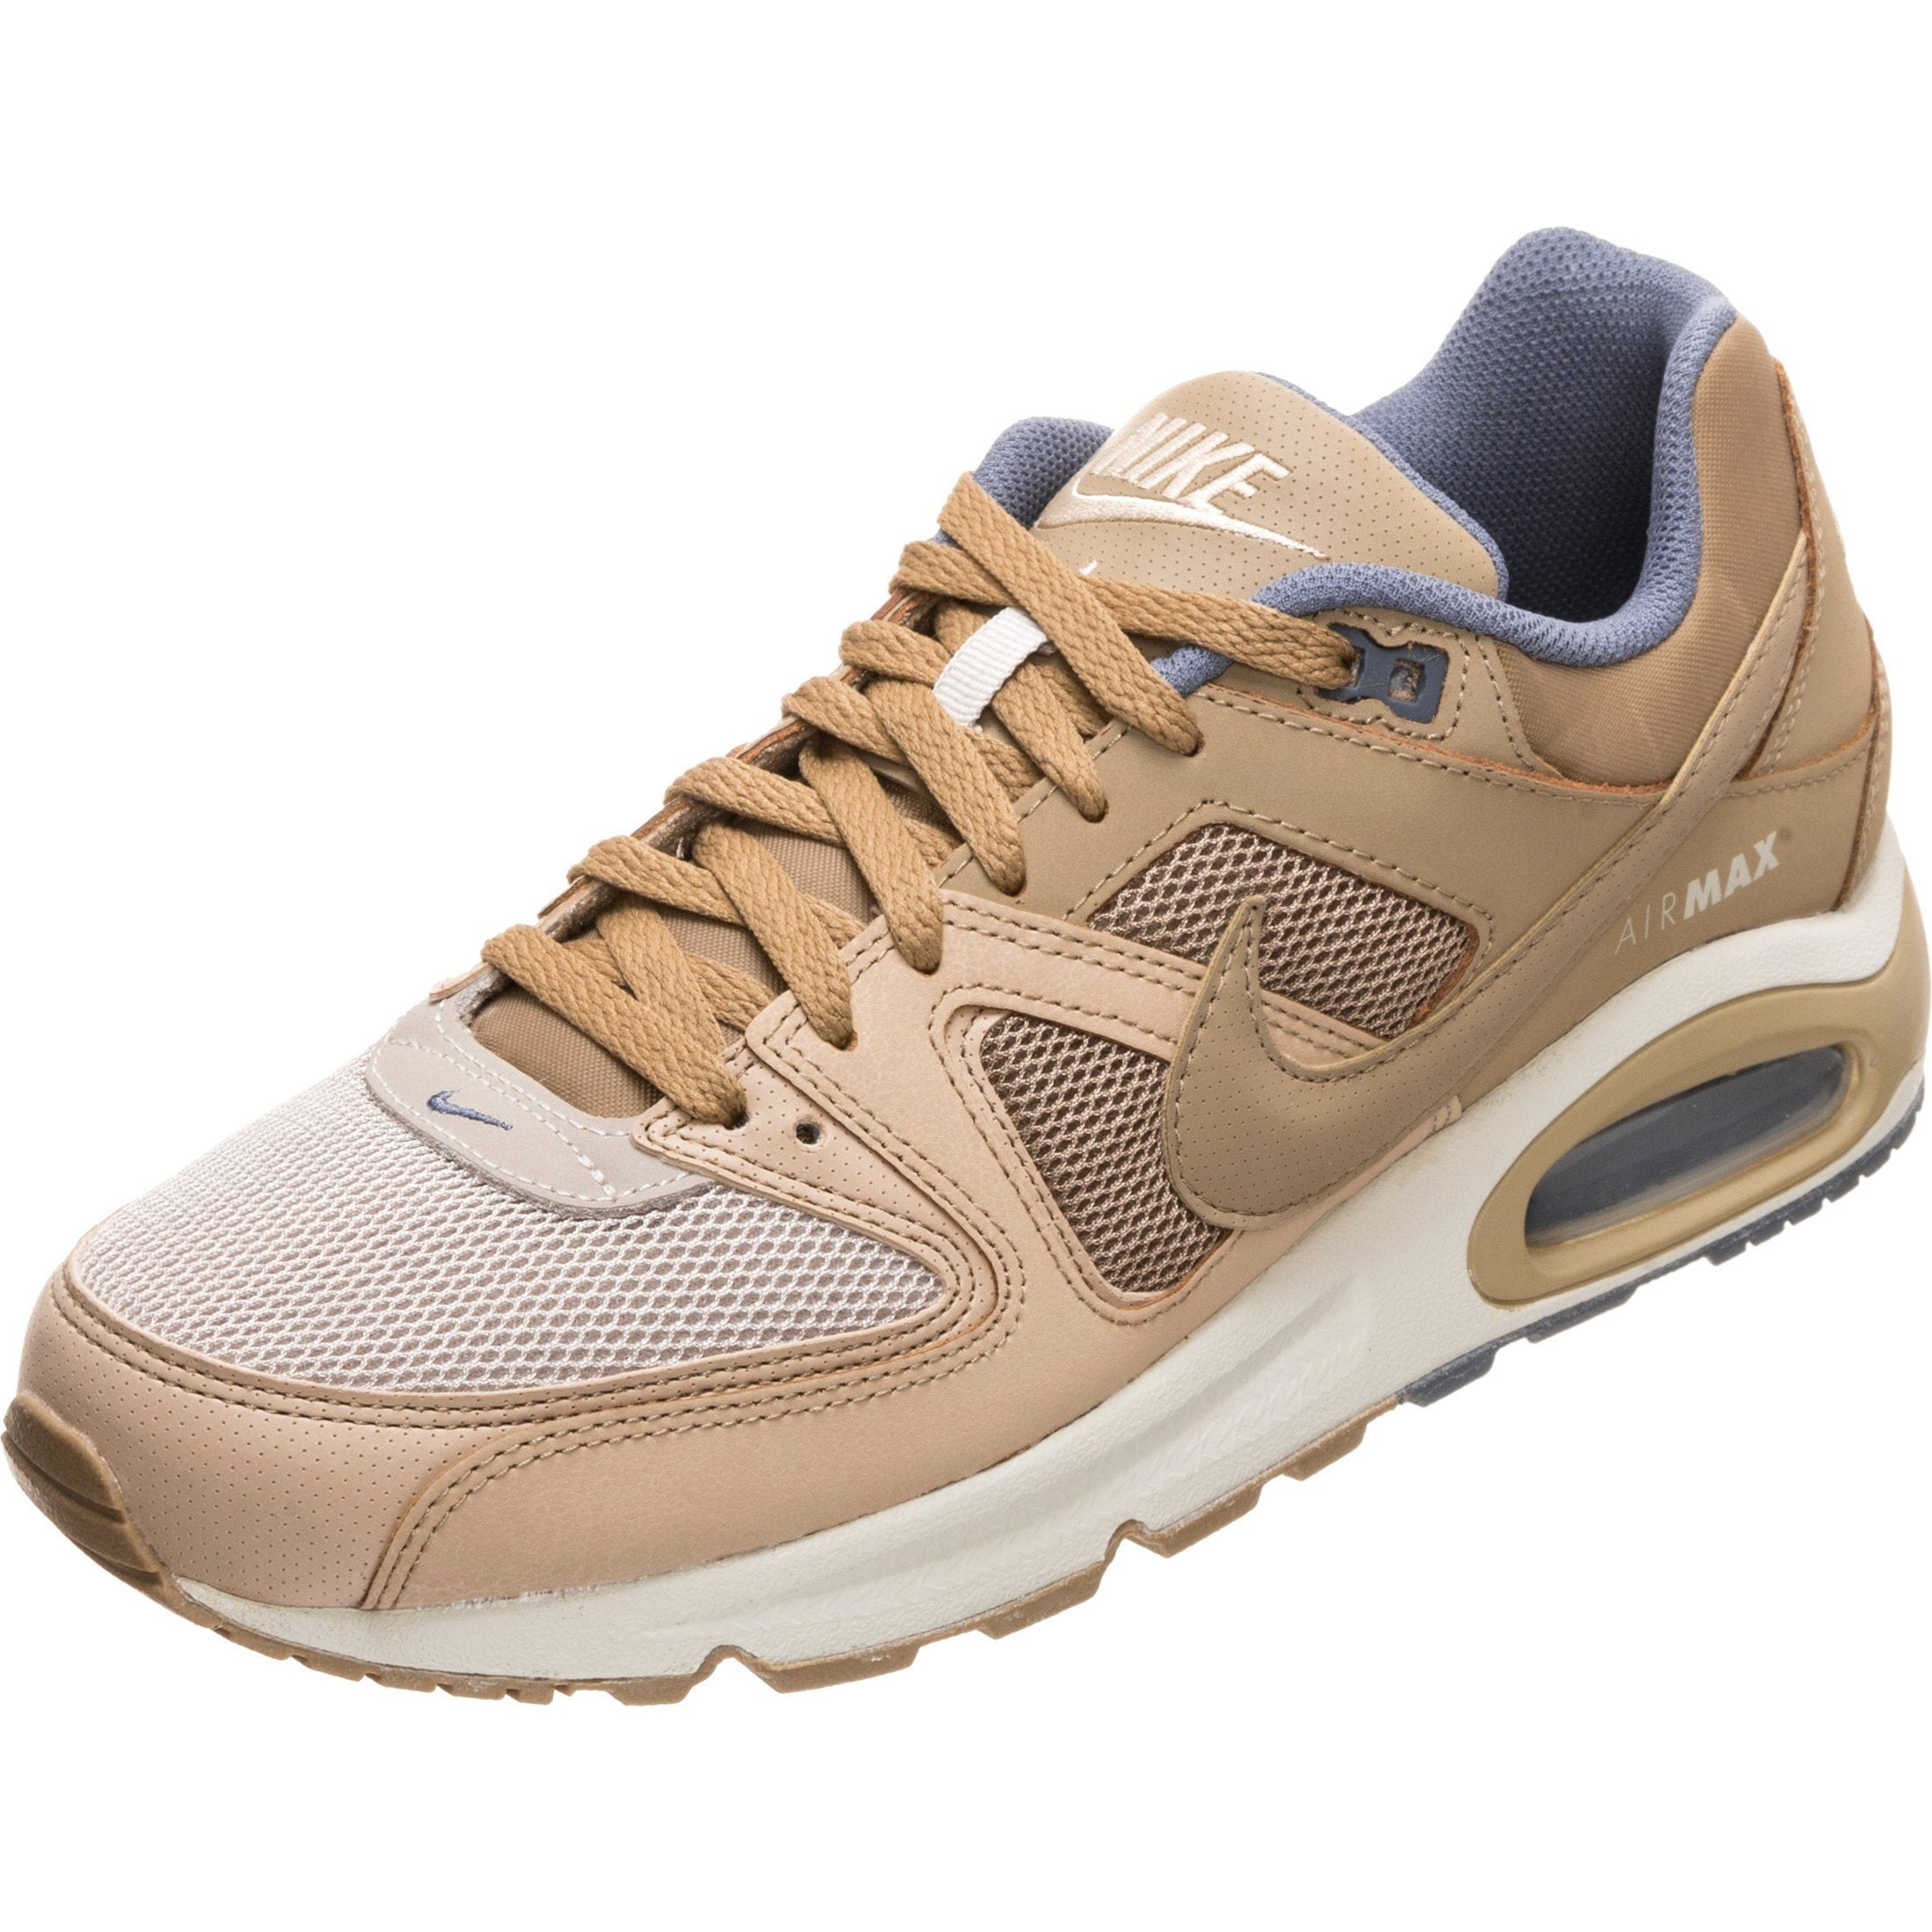 low priced f7a83 46914 nike-sportswear-sneaker-air-max-command-sneaker.jpgoriginal